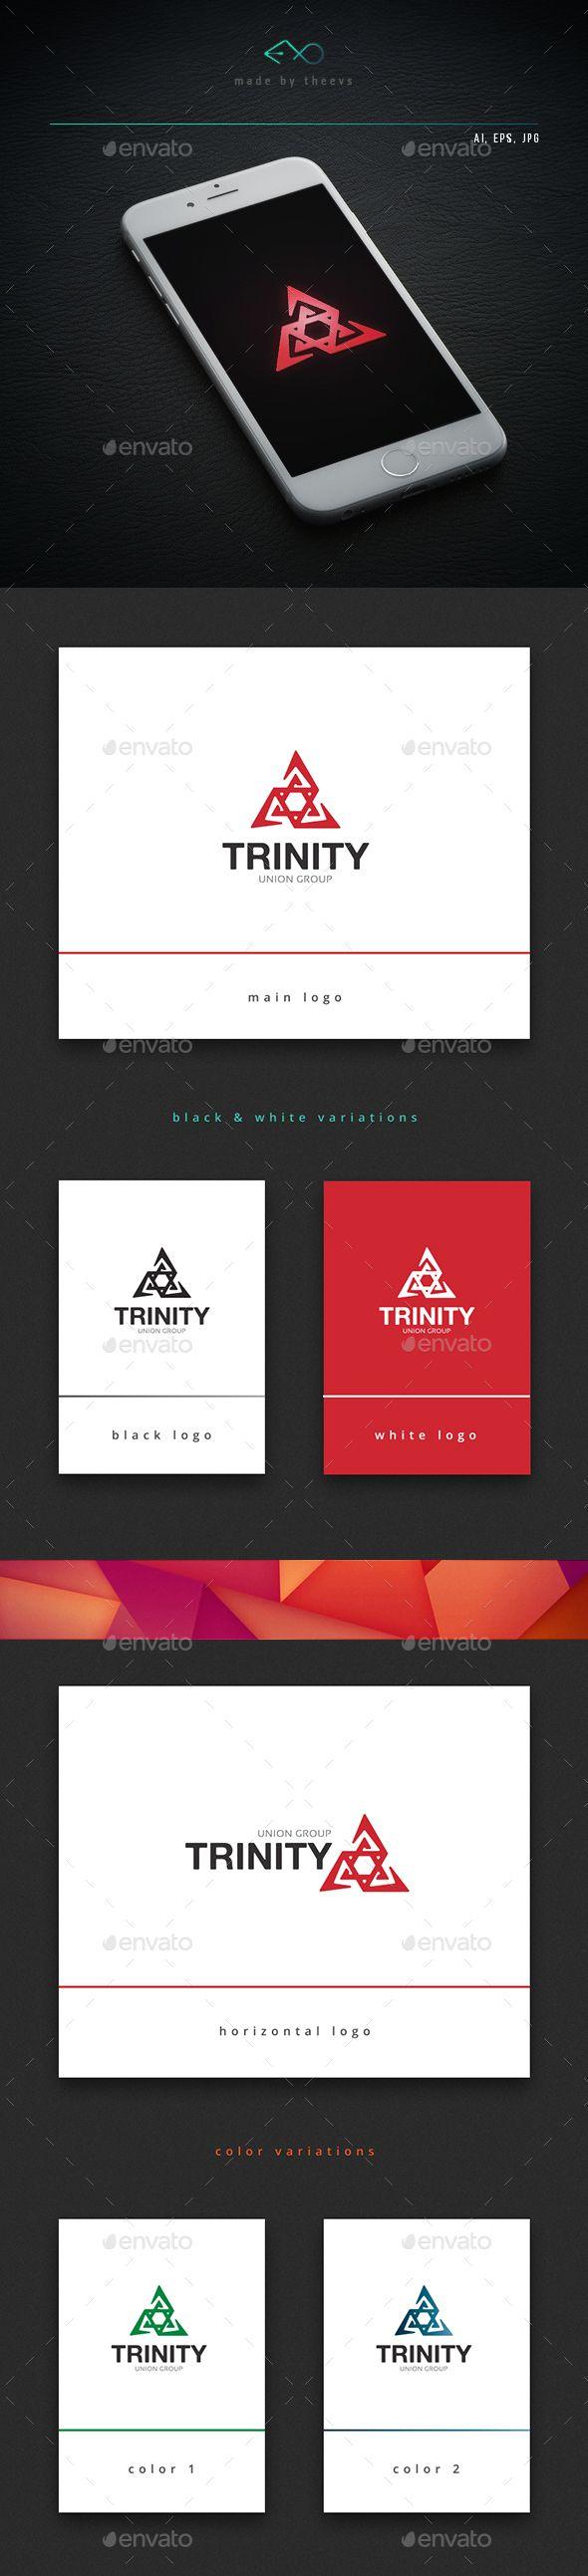 Trinity — Vector EPS #star #company • Available here → https://graphicriver.net/item/trinity/13078556?ref=pxcr